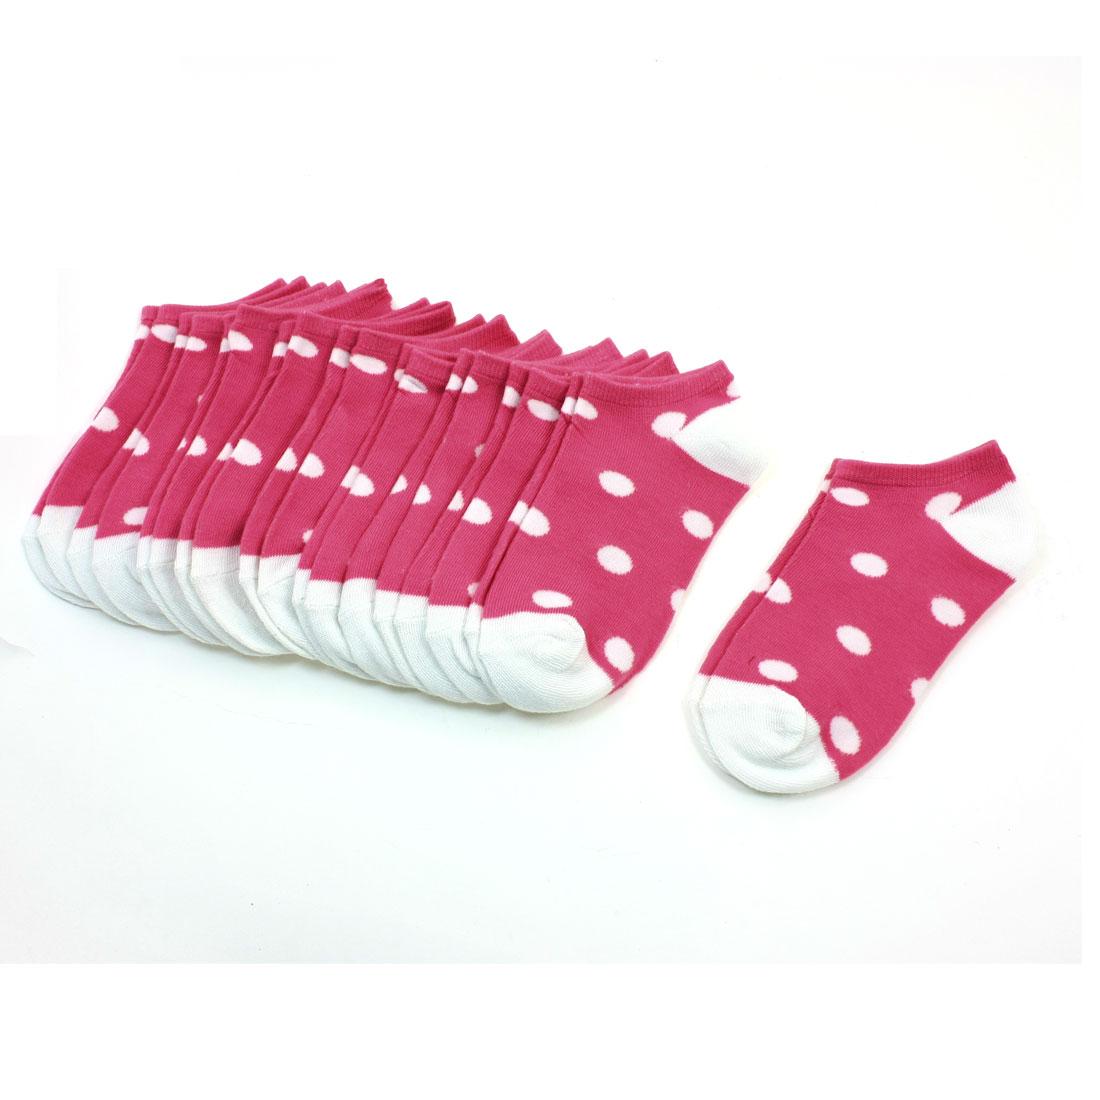 Girls Dot Pattern Textured Elastic Footsie Low Cut Socks Pink White 10 Pairs